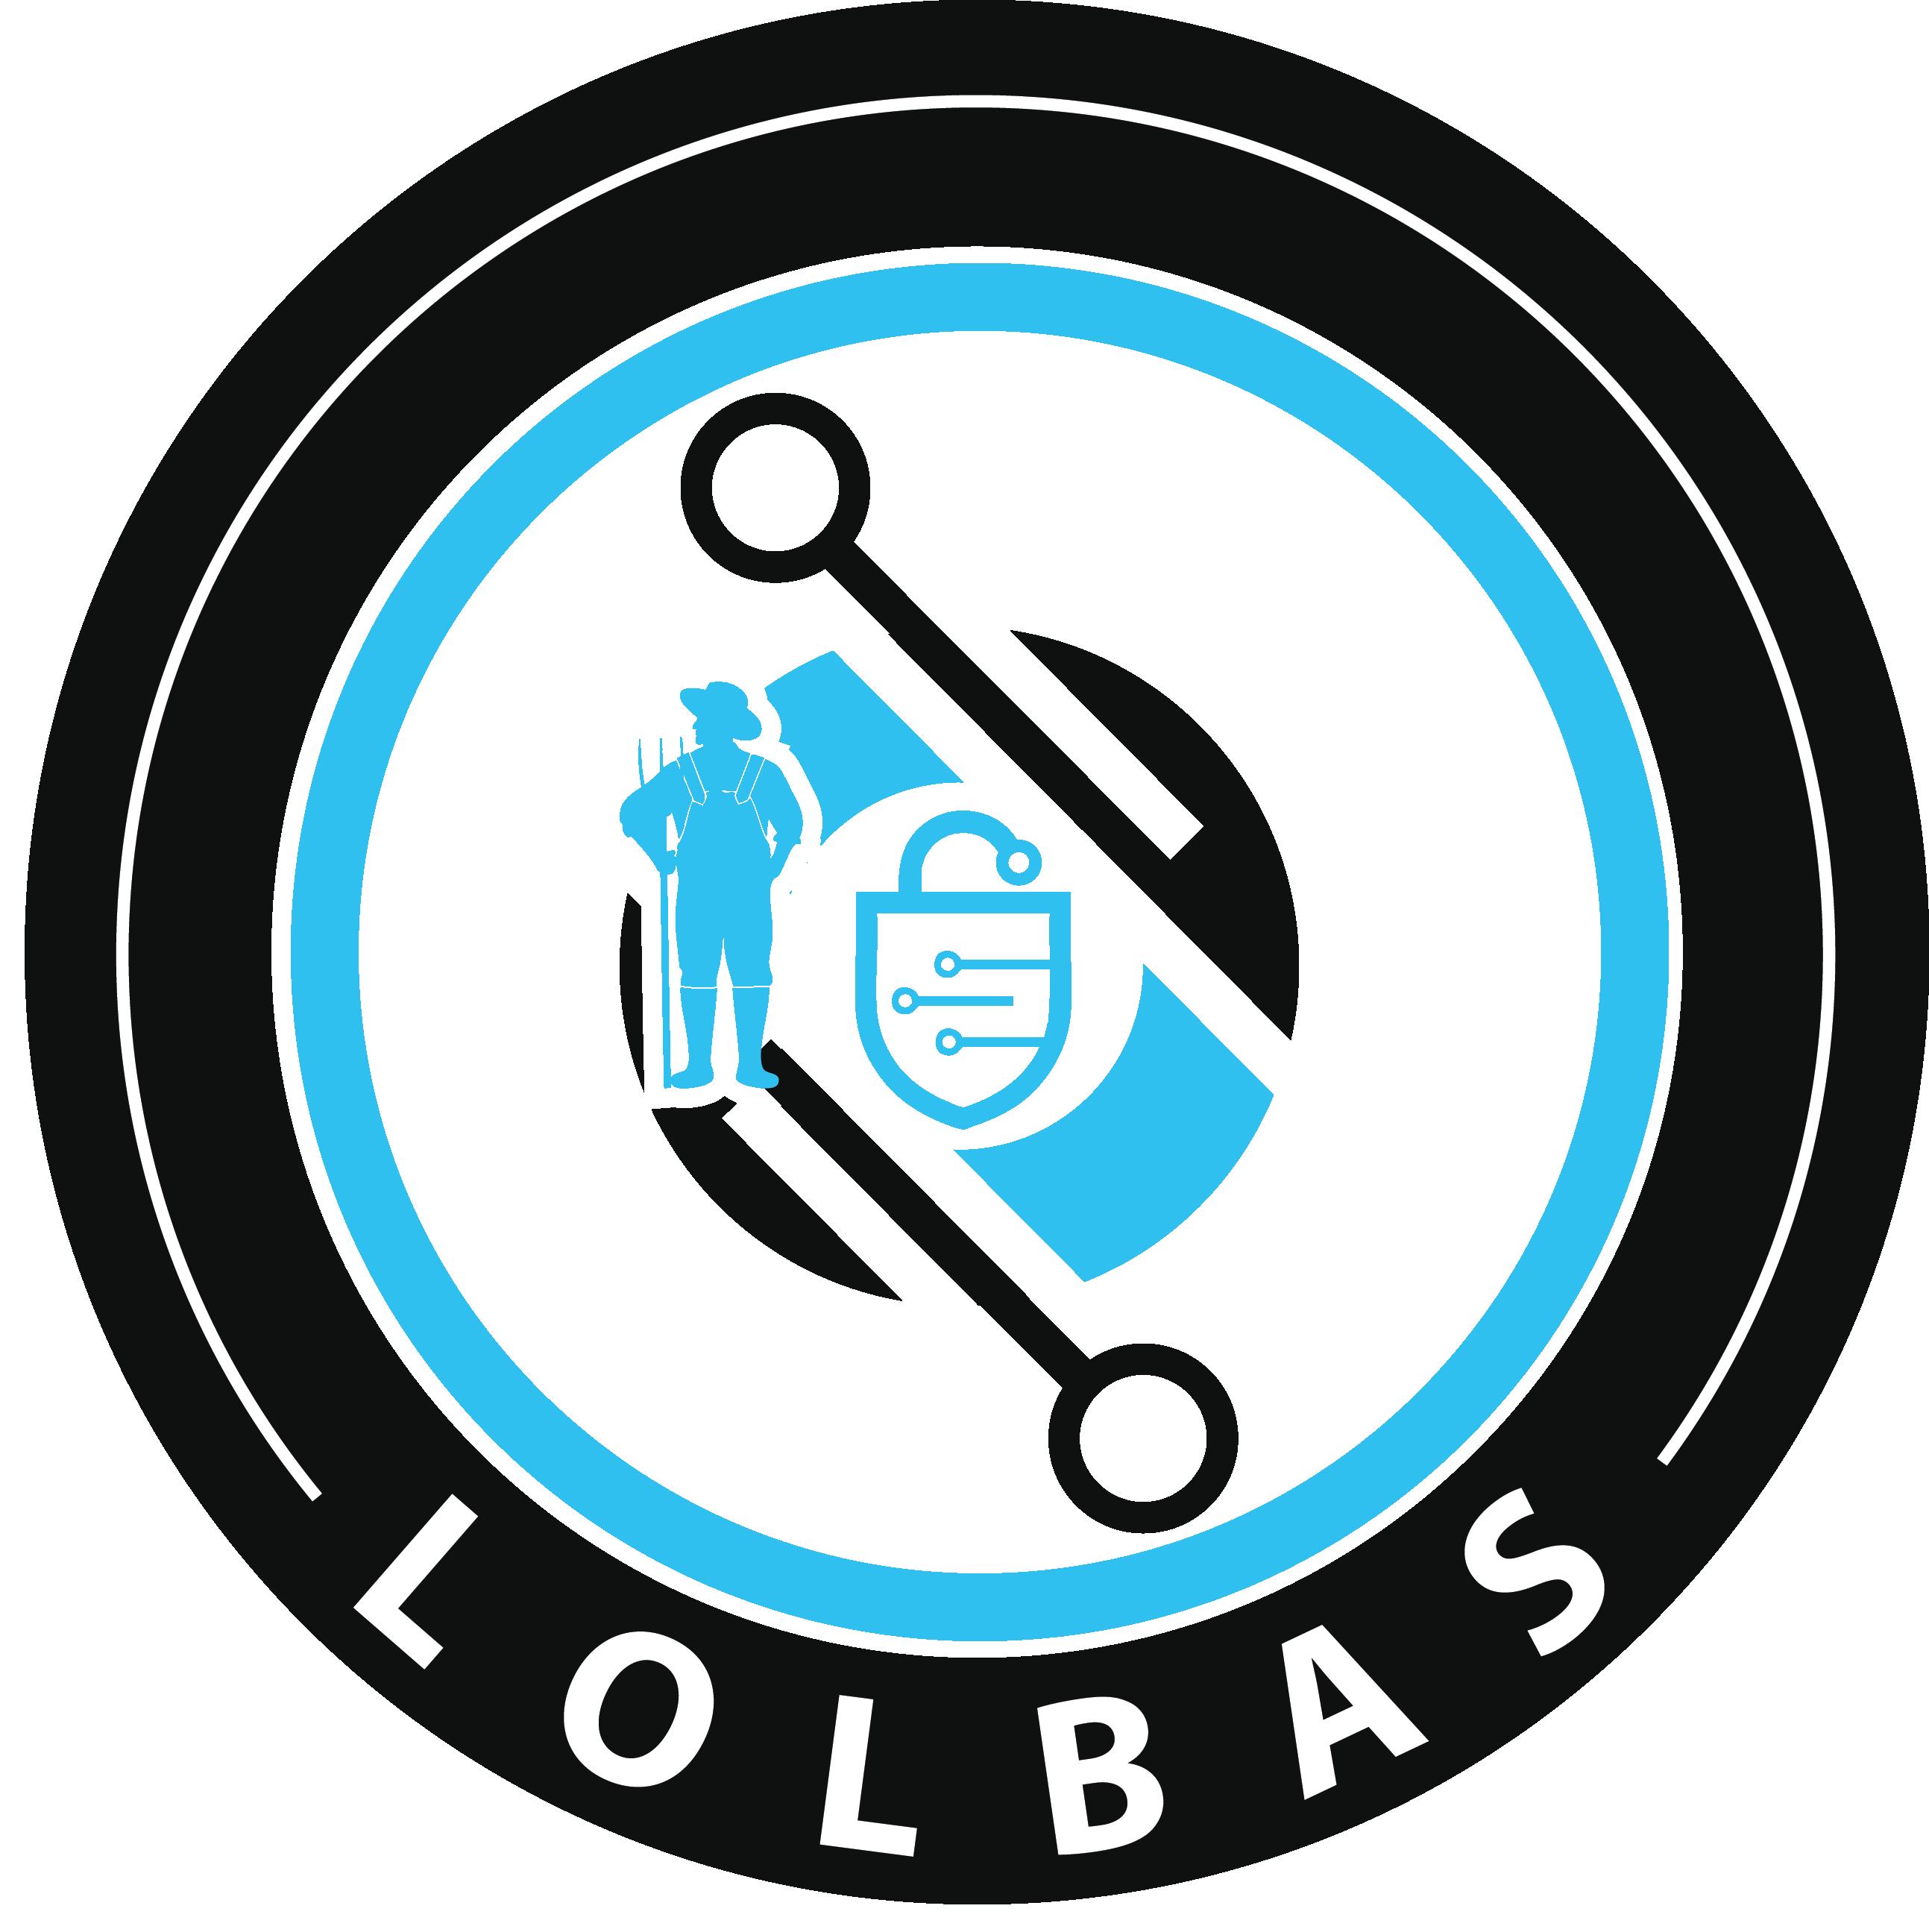 lolbas-project.github.io